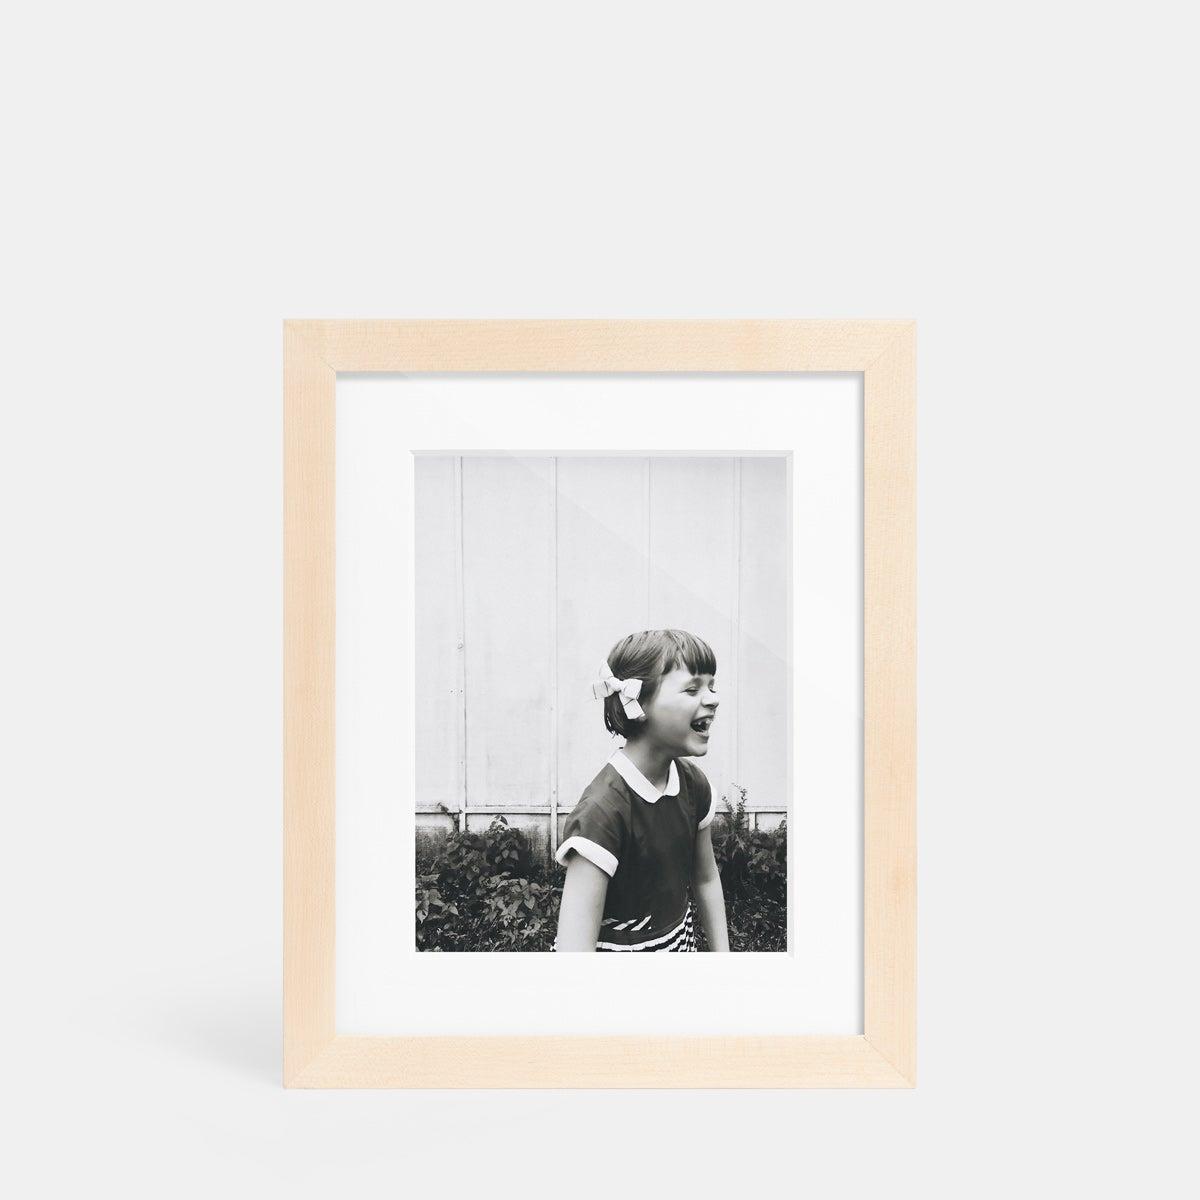 Instagram Friendly Frames